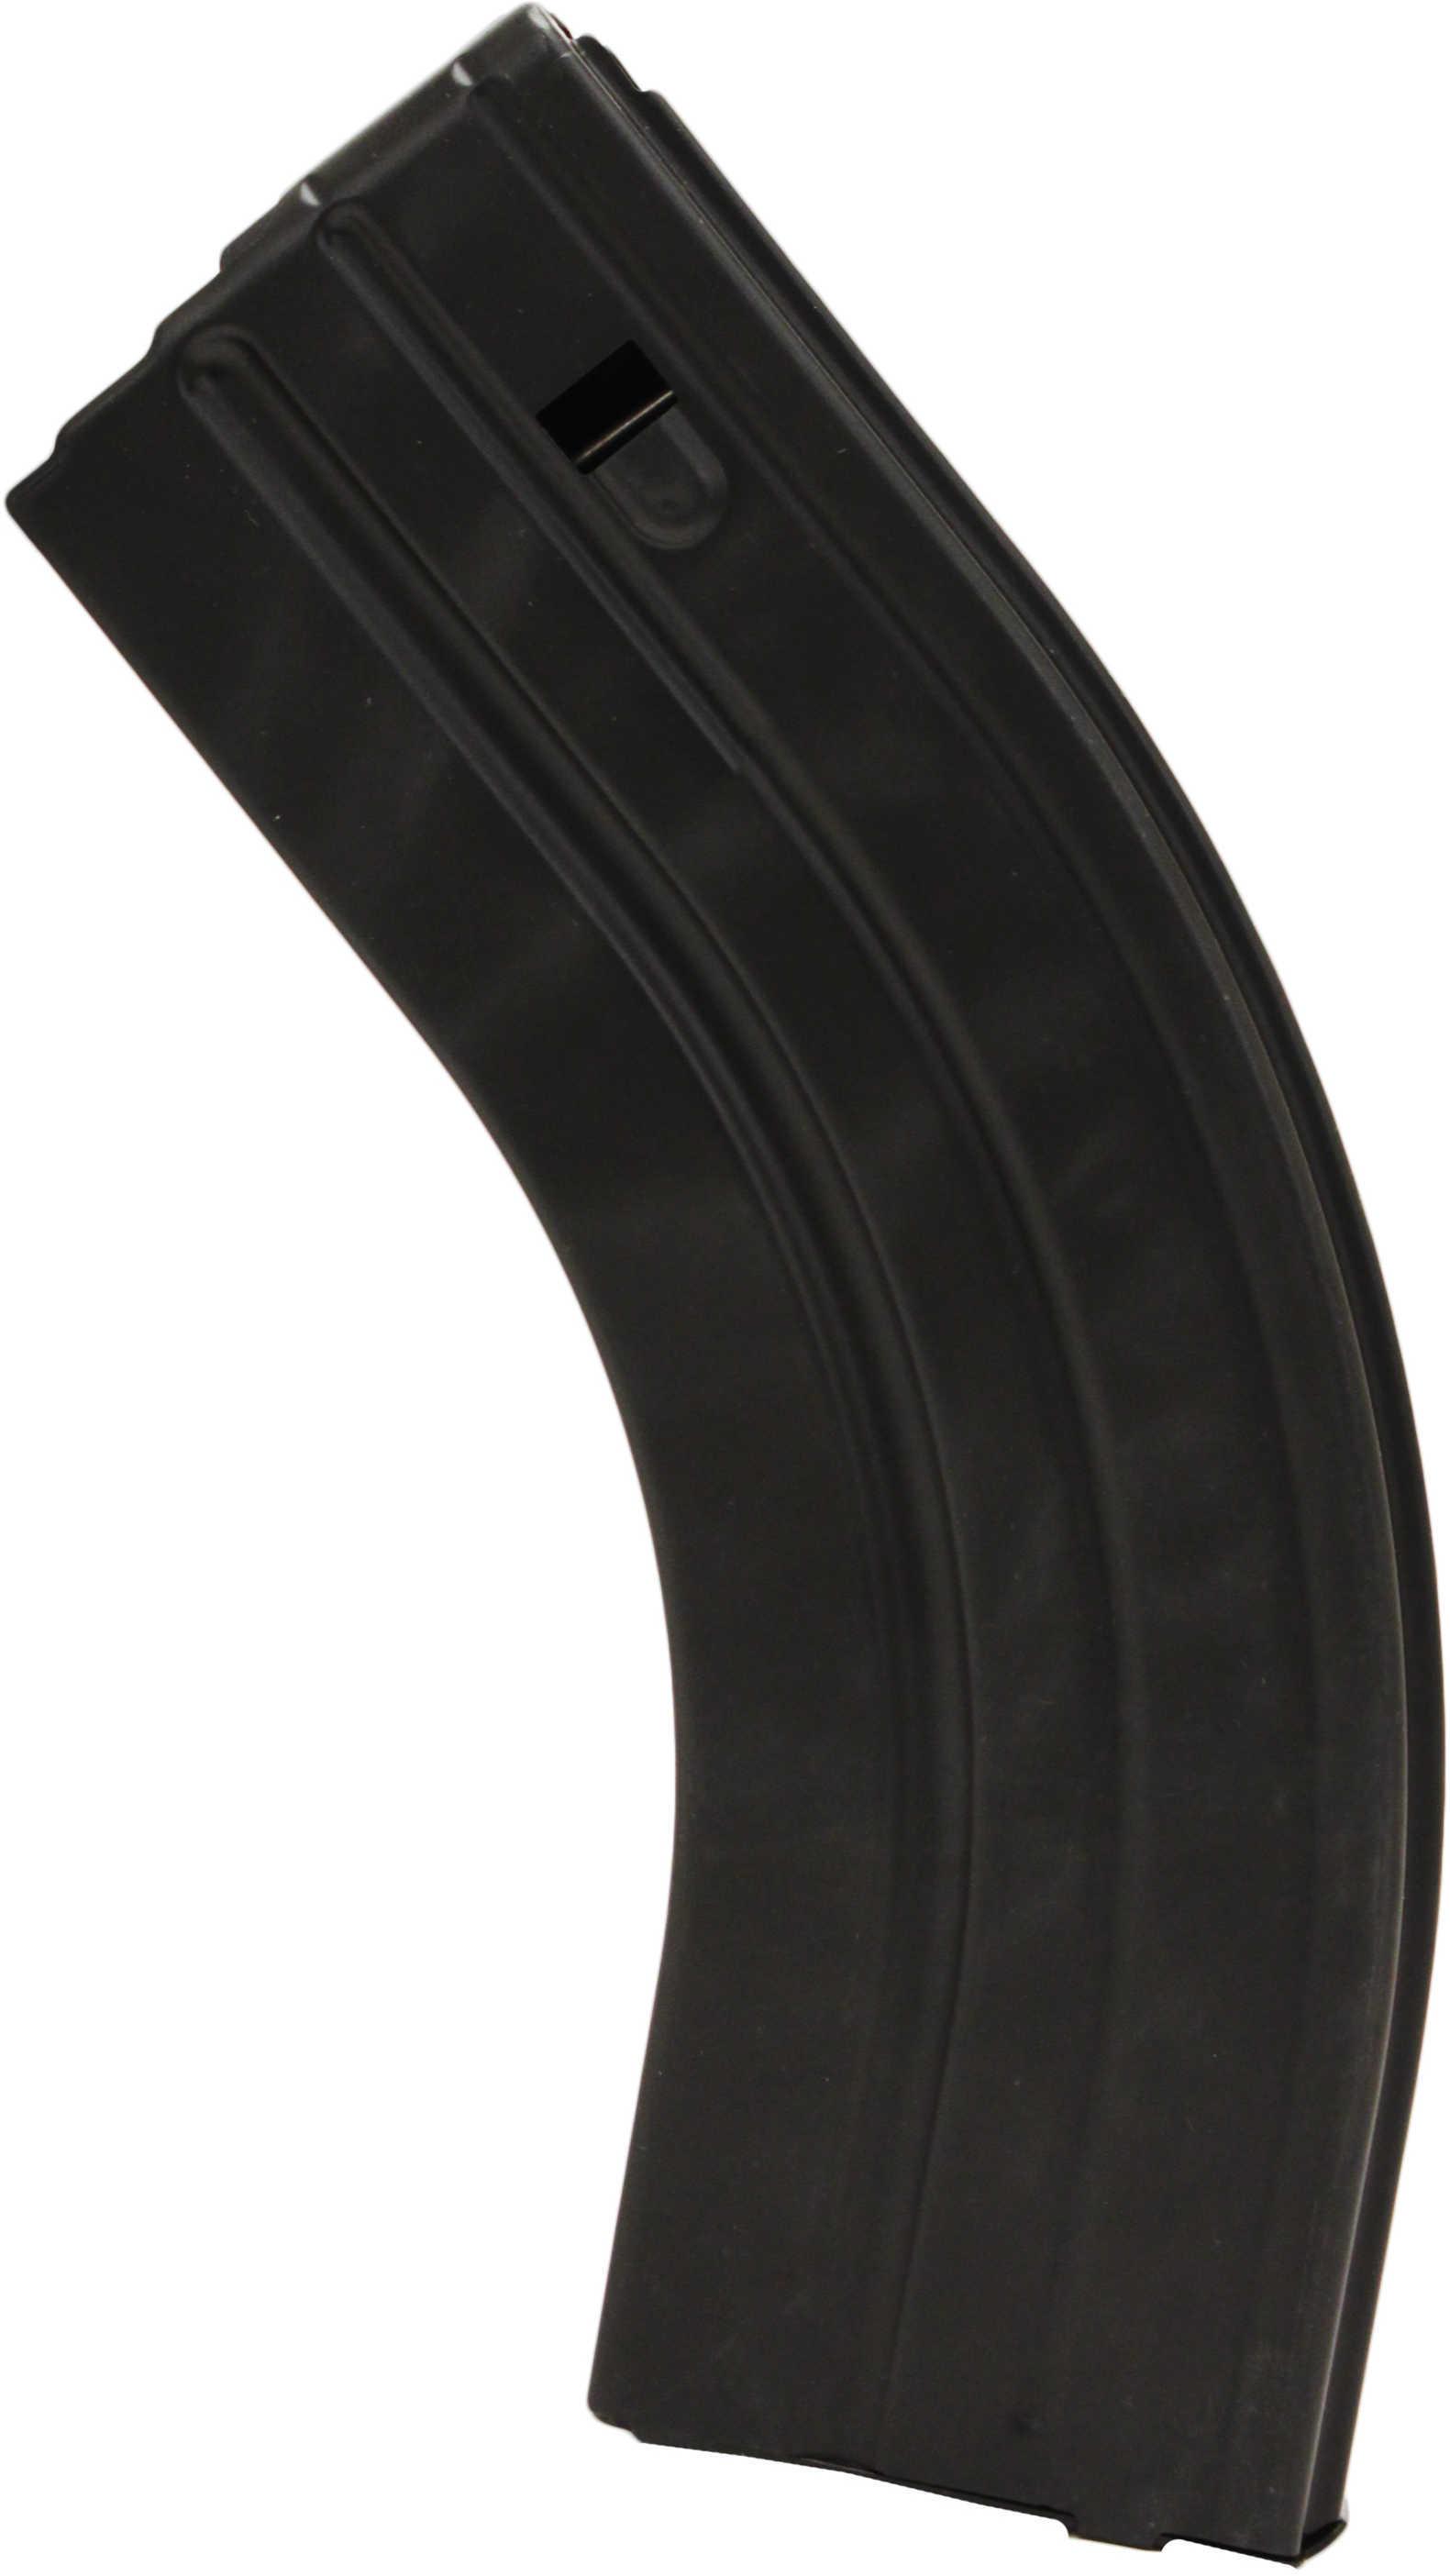 C Products Defense AR-15 Magazine 7.62x39 SS Matte Black/Black Follower 30 Round (Per 1) 3062041185CPD